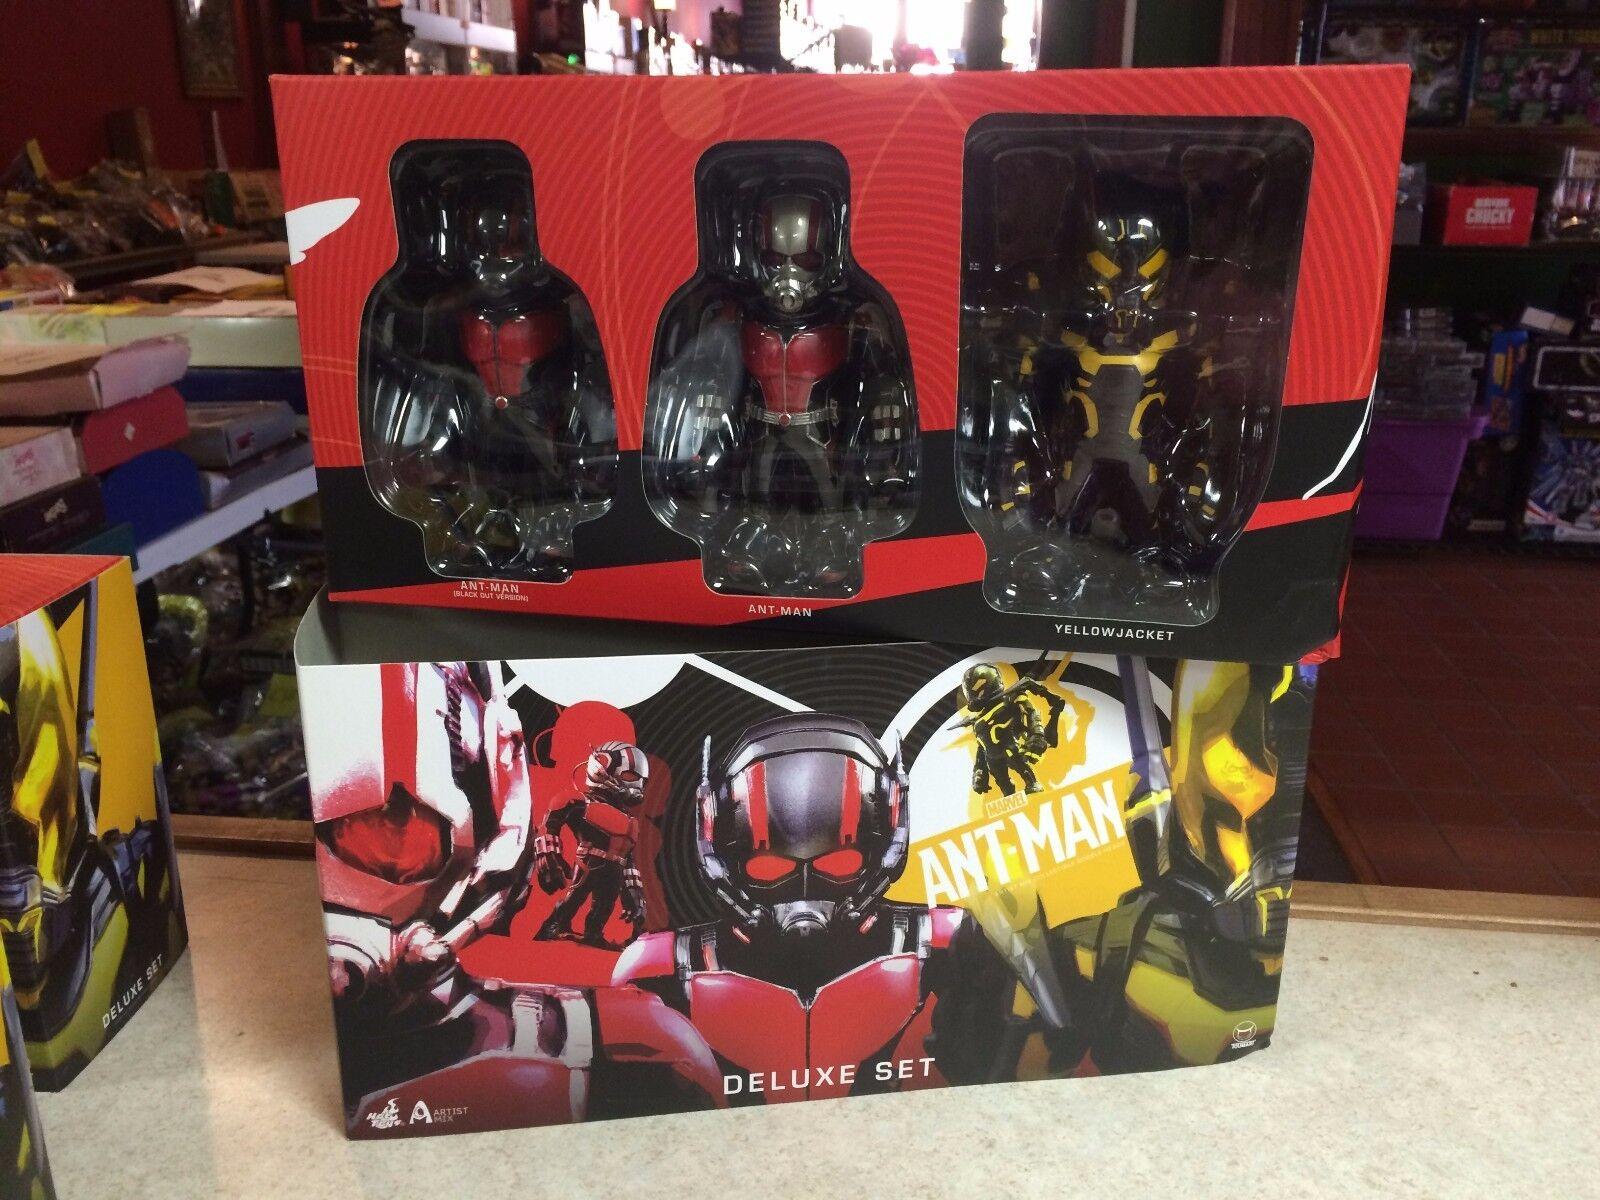 2015 Hot Toys of Marvel ANT-MAN Artist Mix Deluxe Set of Toys 3 Figure NIB  902467 61d477